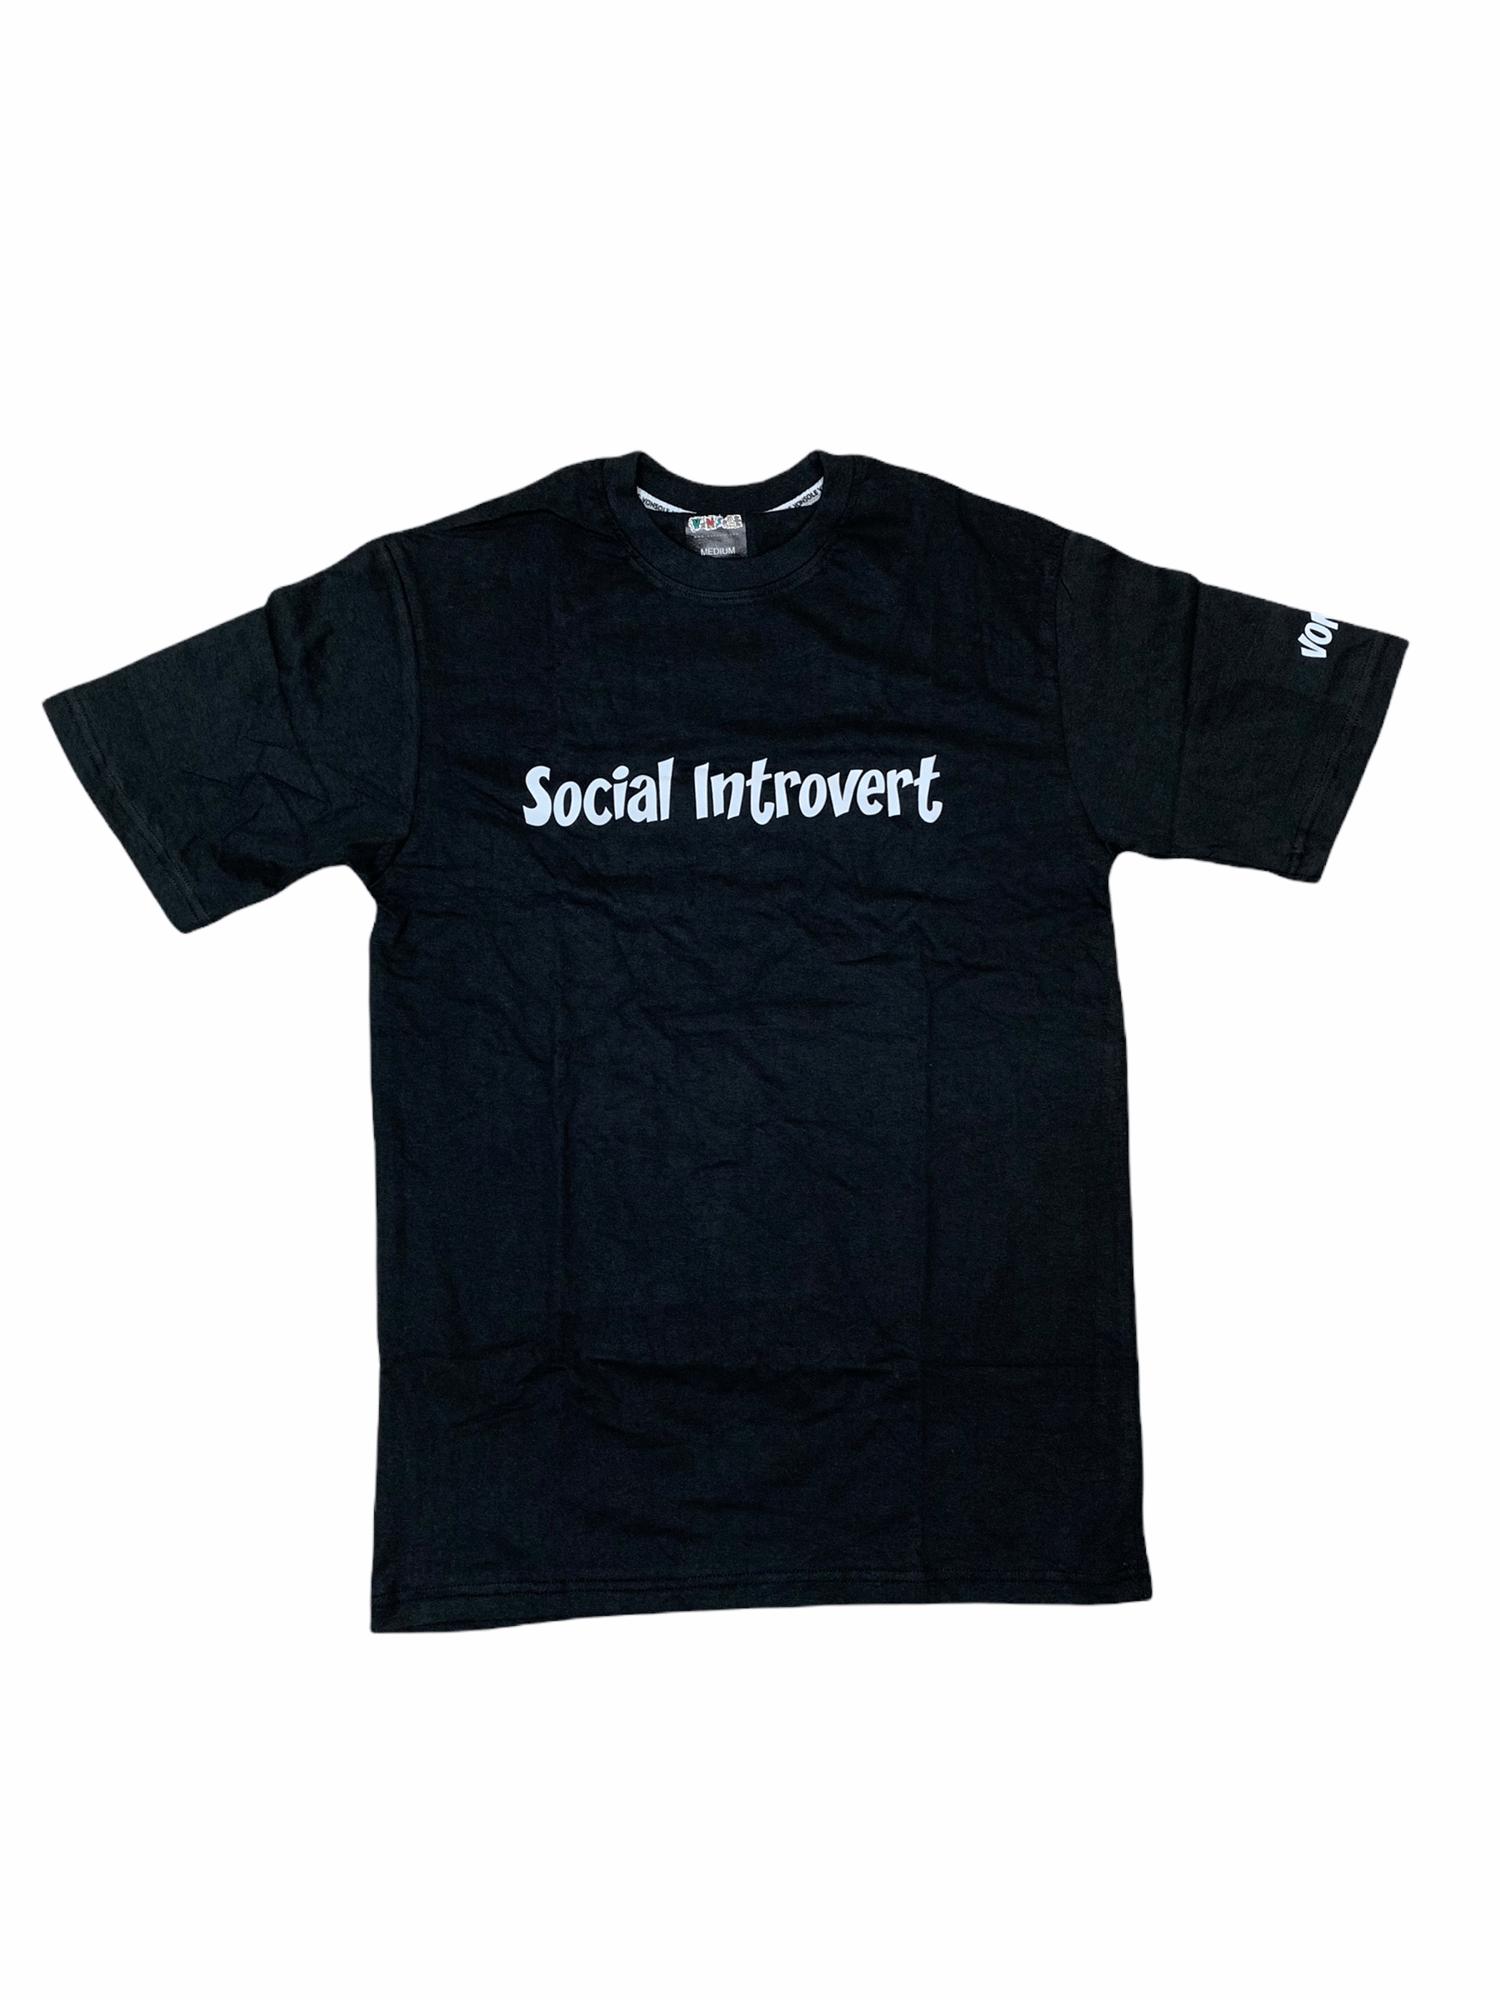 Image of VS Introvert Tee